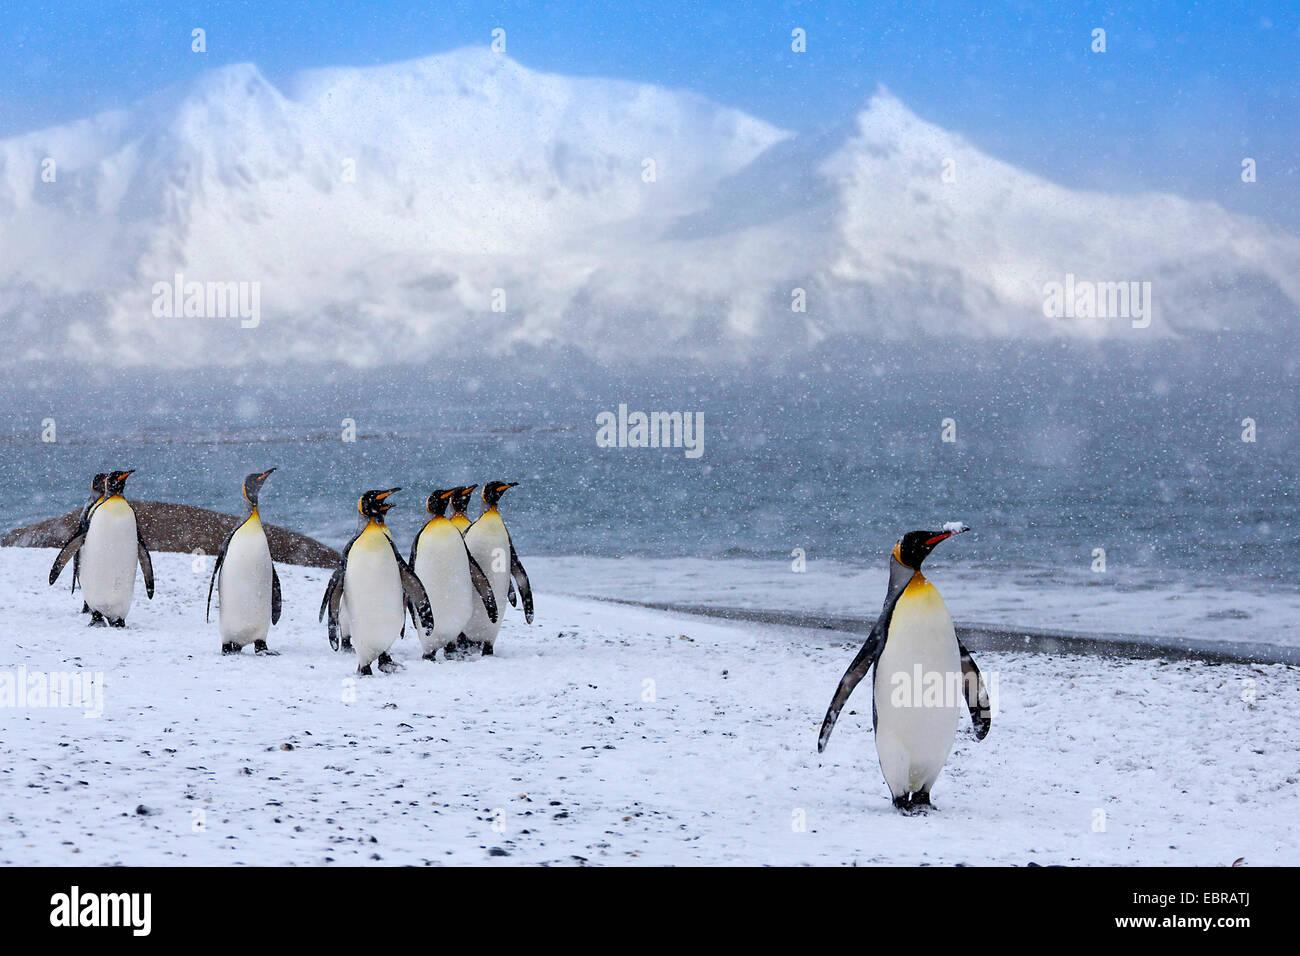 Pinguino reale (Aptenodytes patagonicus), gruppo in forte nevicata, Antartide, Suedgeorgien, St Andrews Bay Immagini Stock